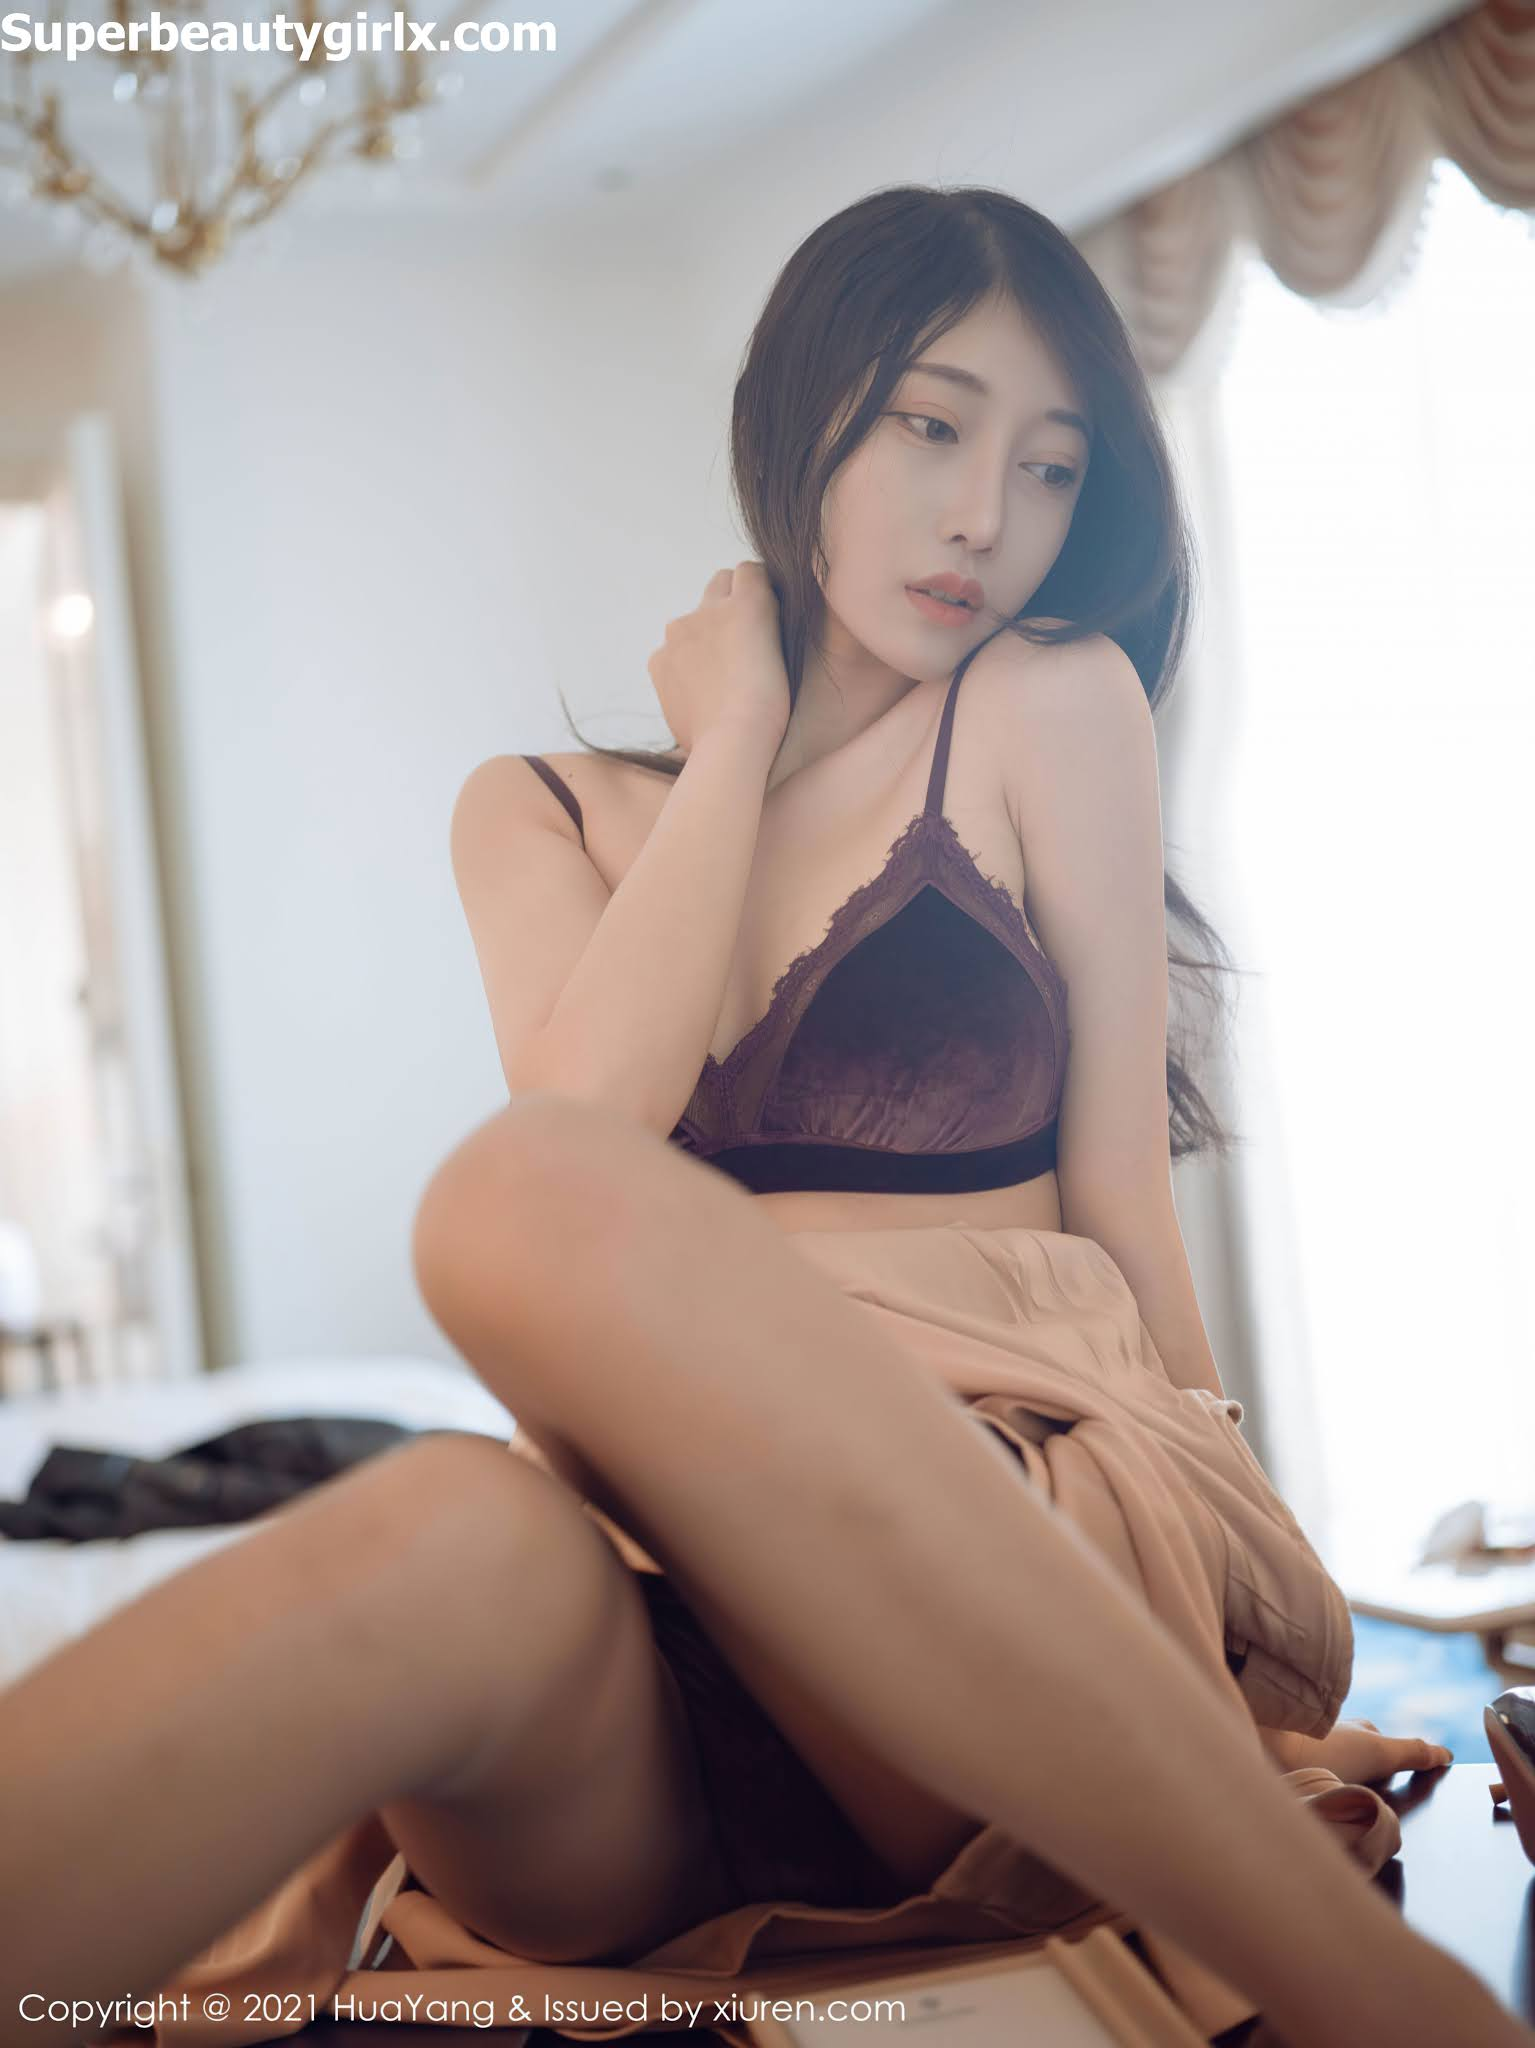 HuaYang-Vol.364-er-Superbeautygirlx.com